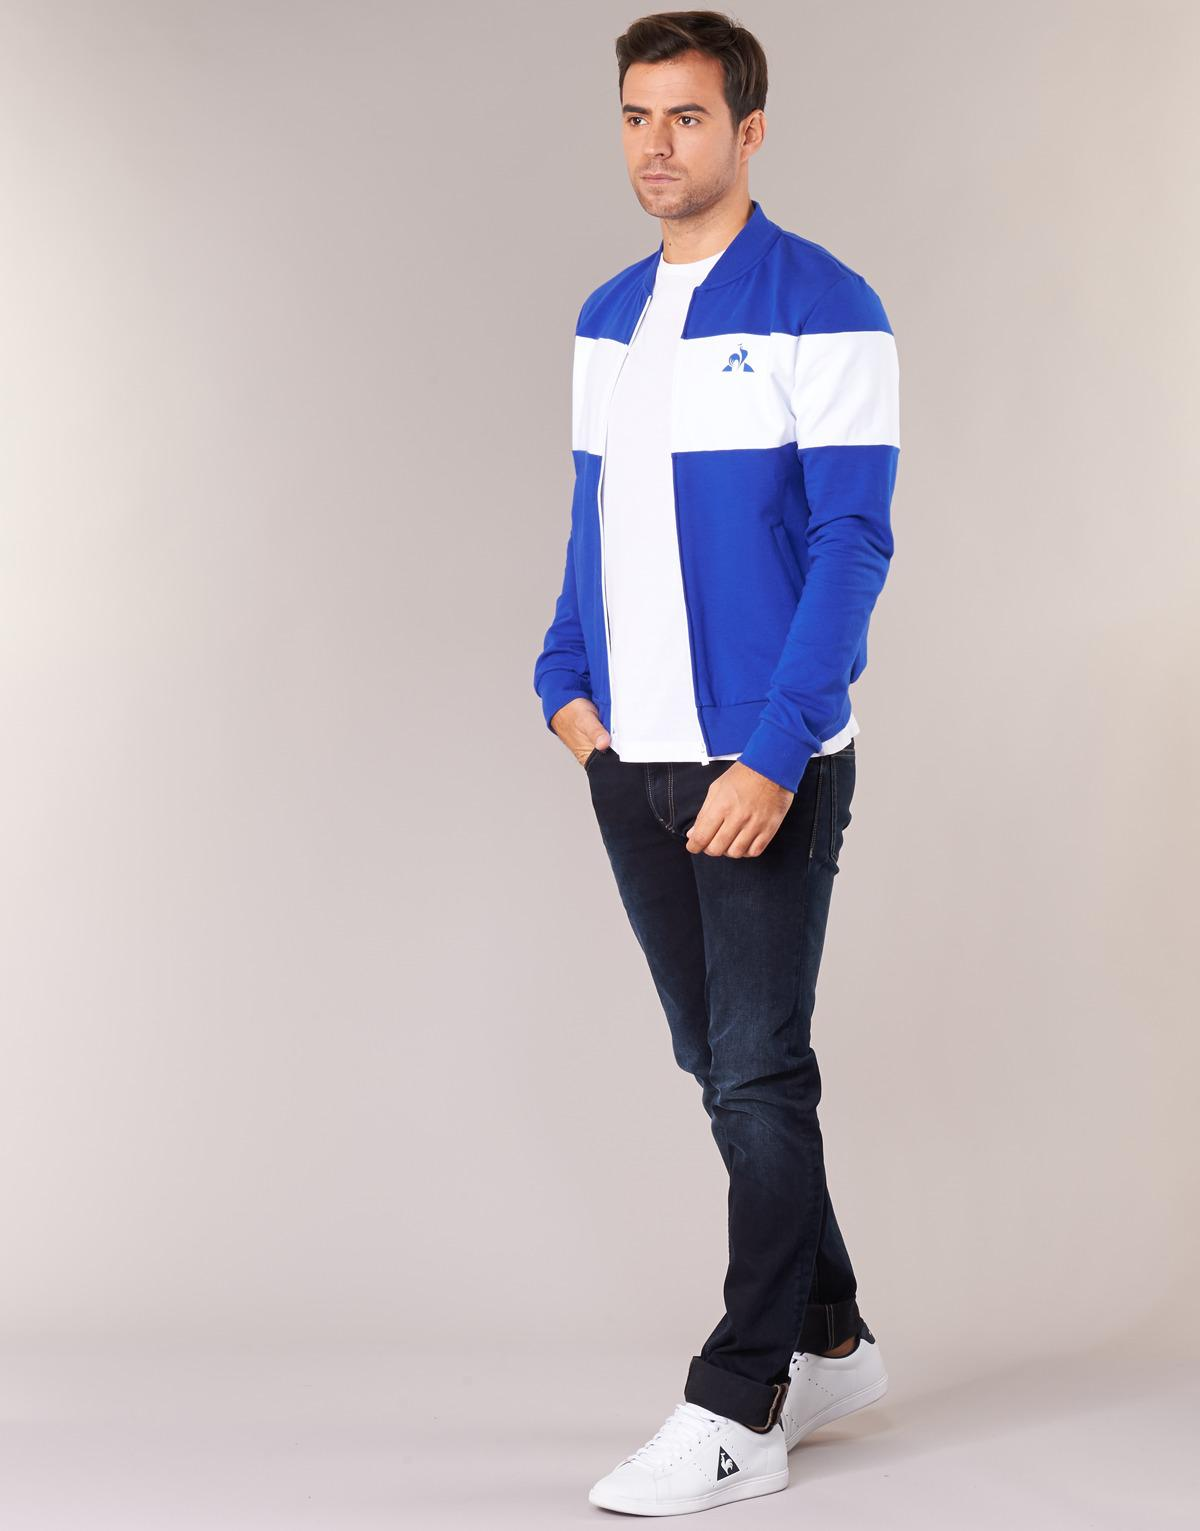 Le Coq Sportif Fatipu Men's Sweatshirt In Blue for Men